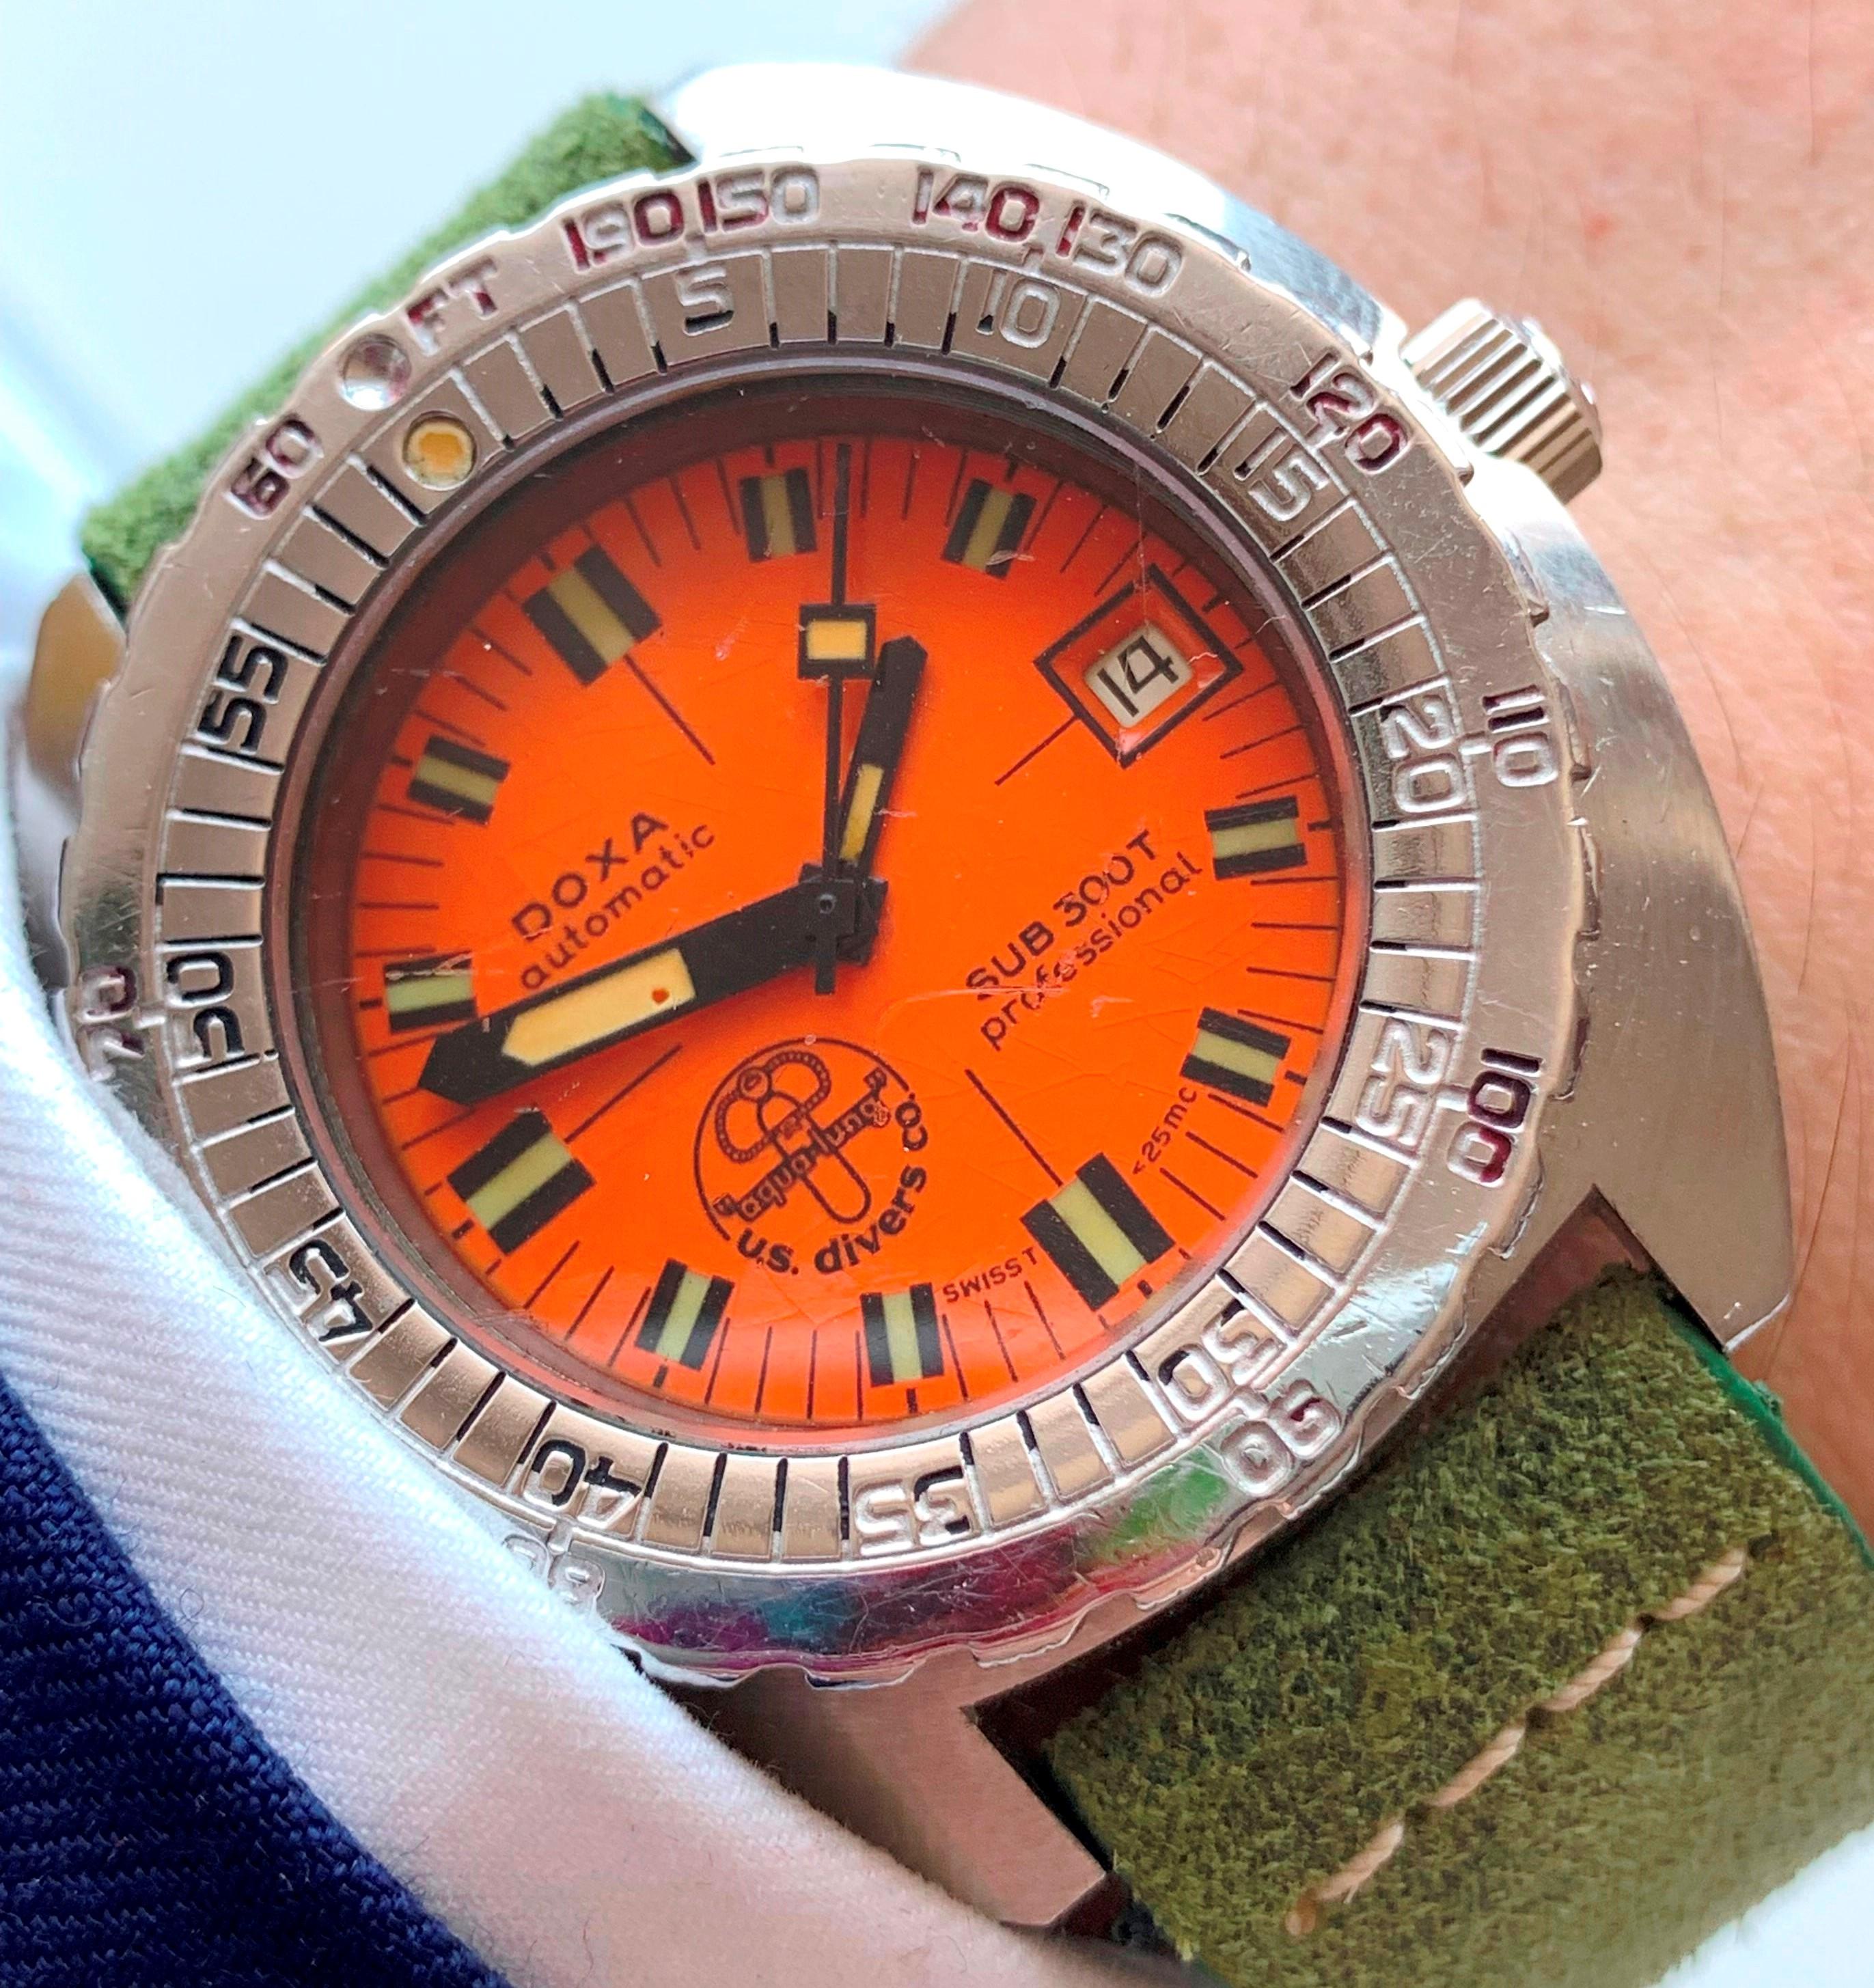 Doxa Sub 300T Diver Watch Vintage US Aqua Lung Special Edition